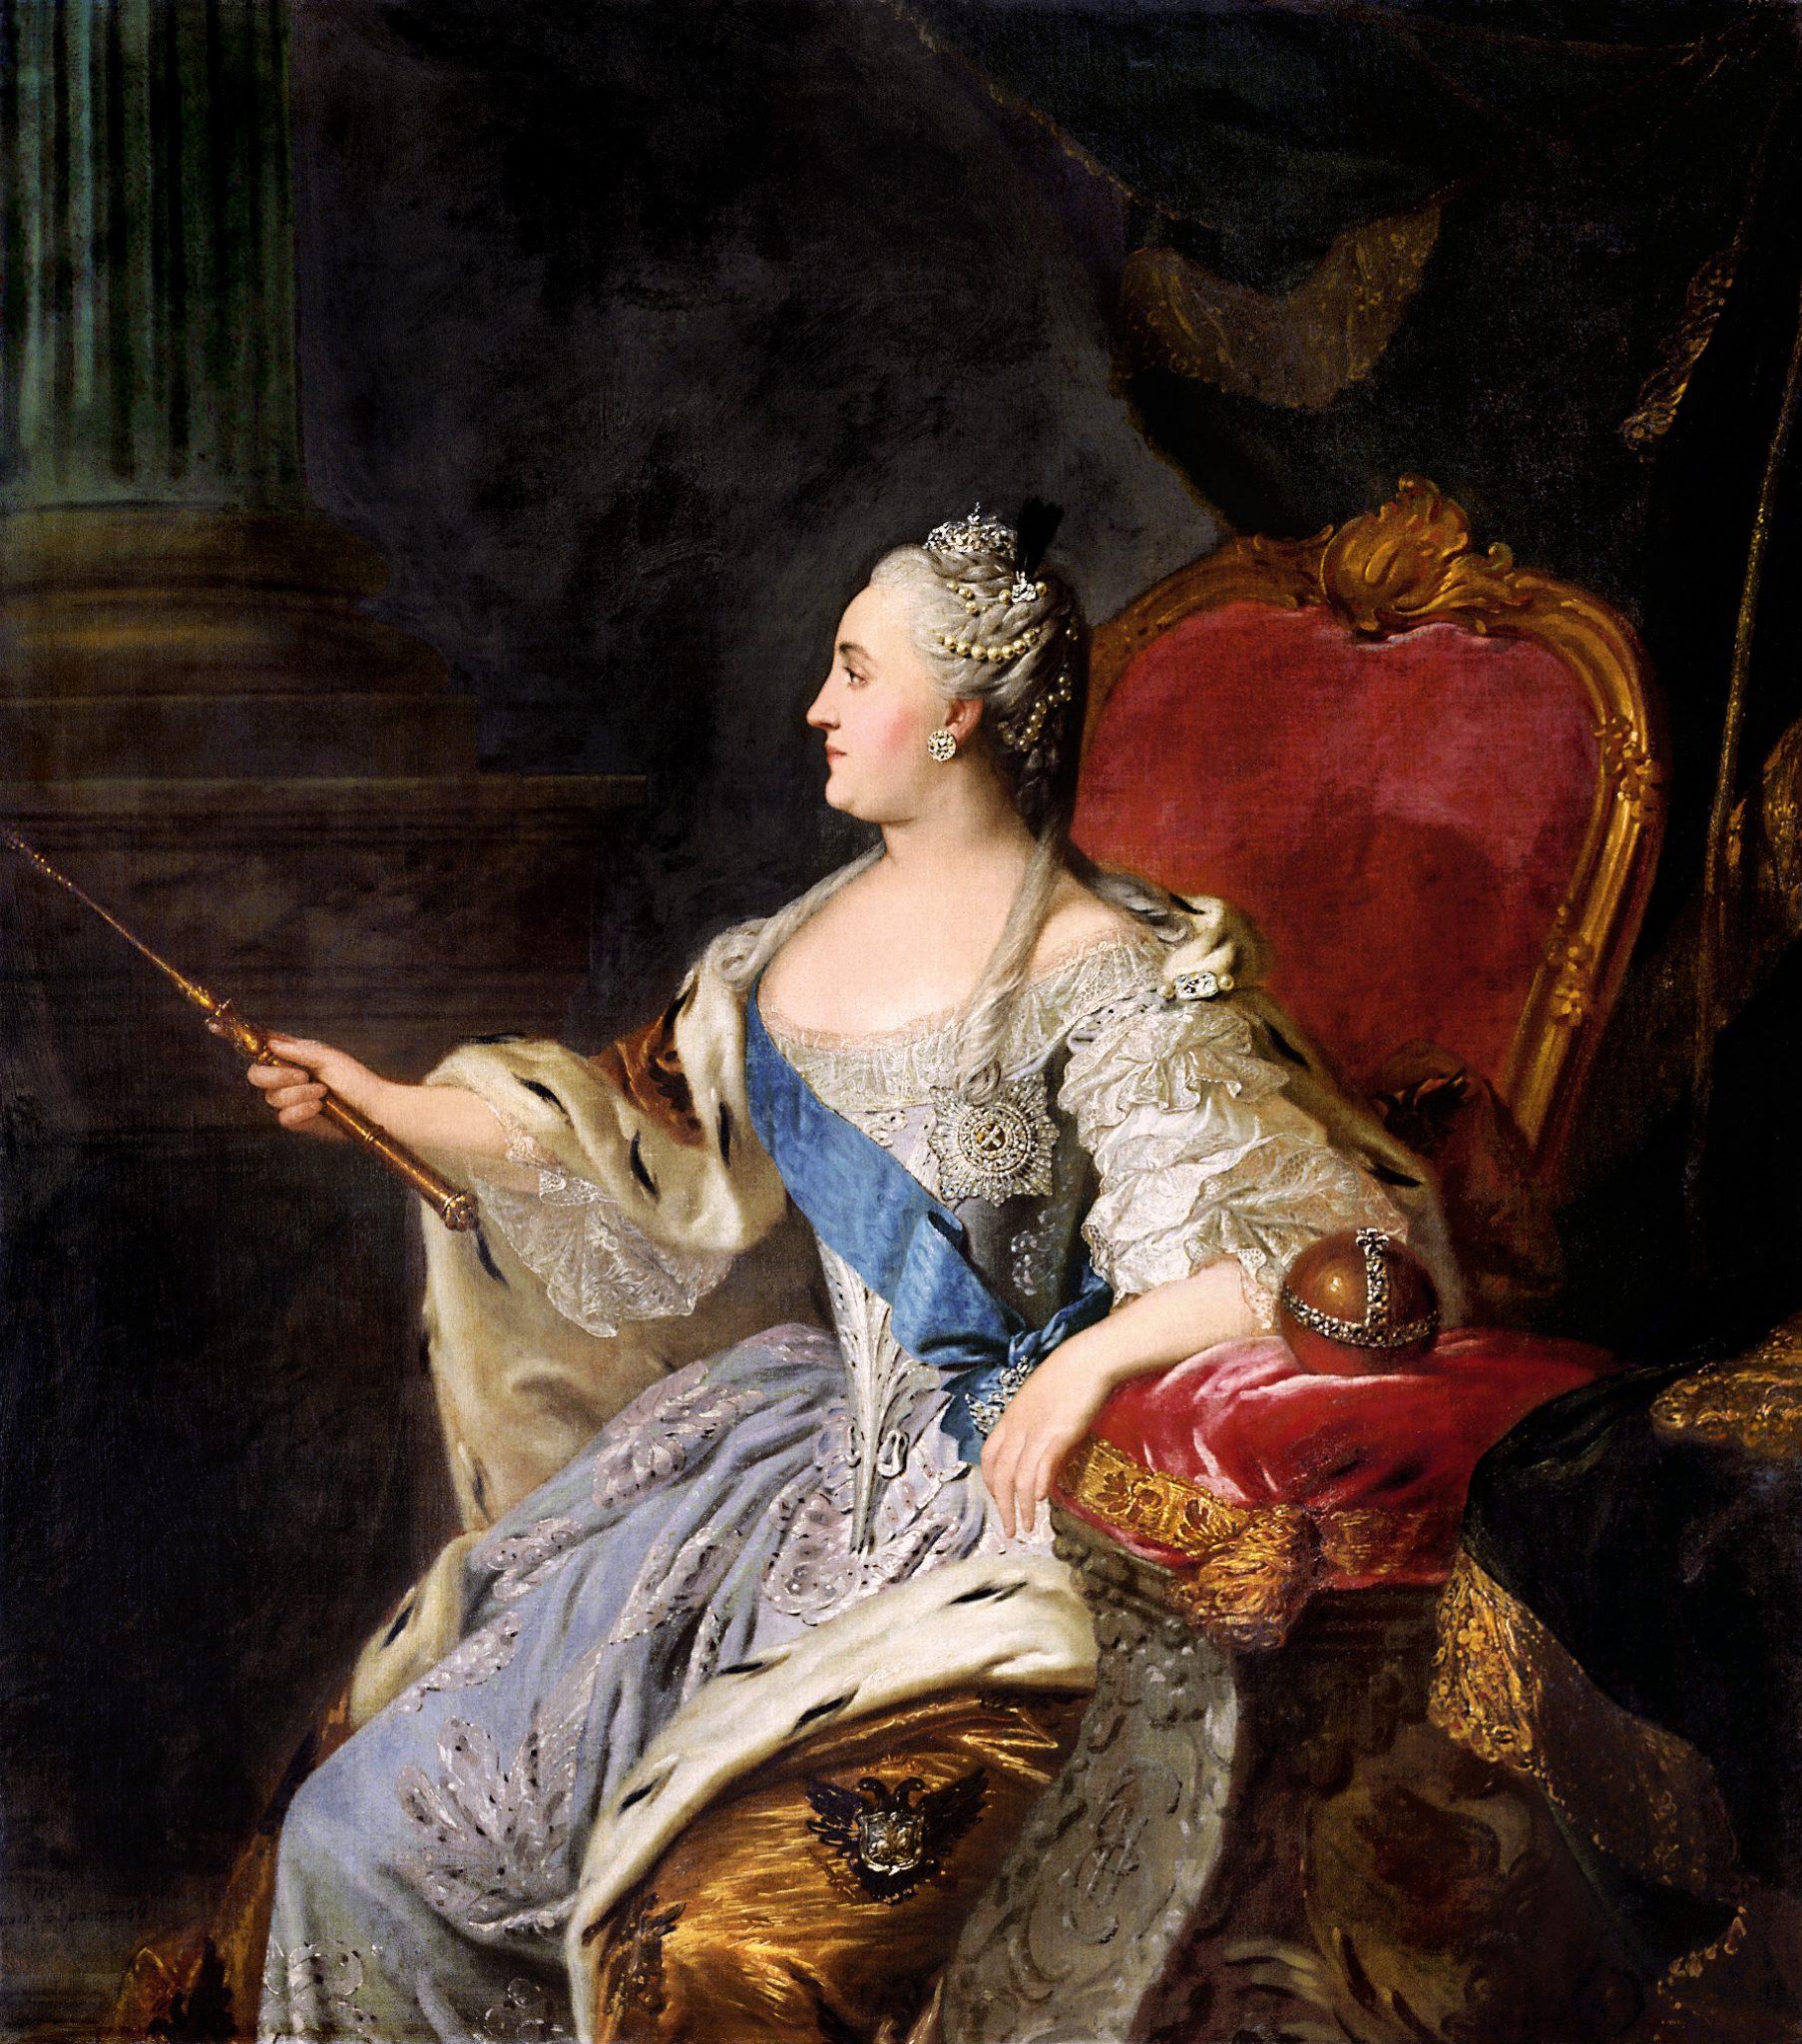 The future Empress Catherine II